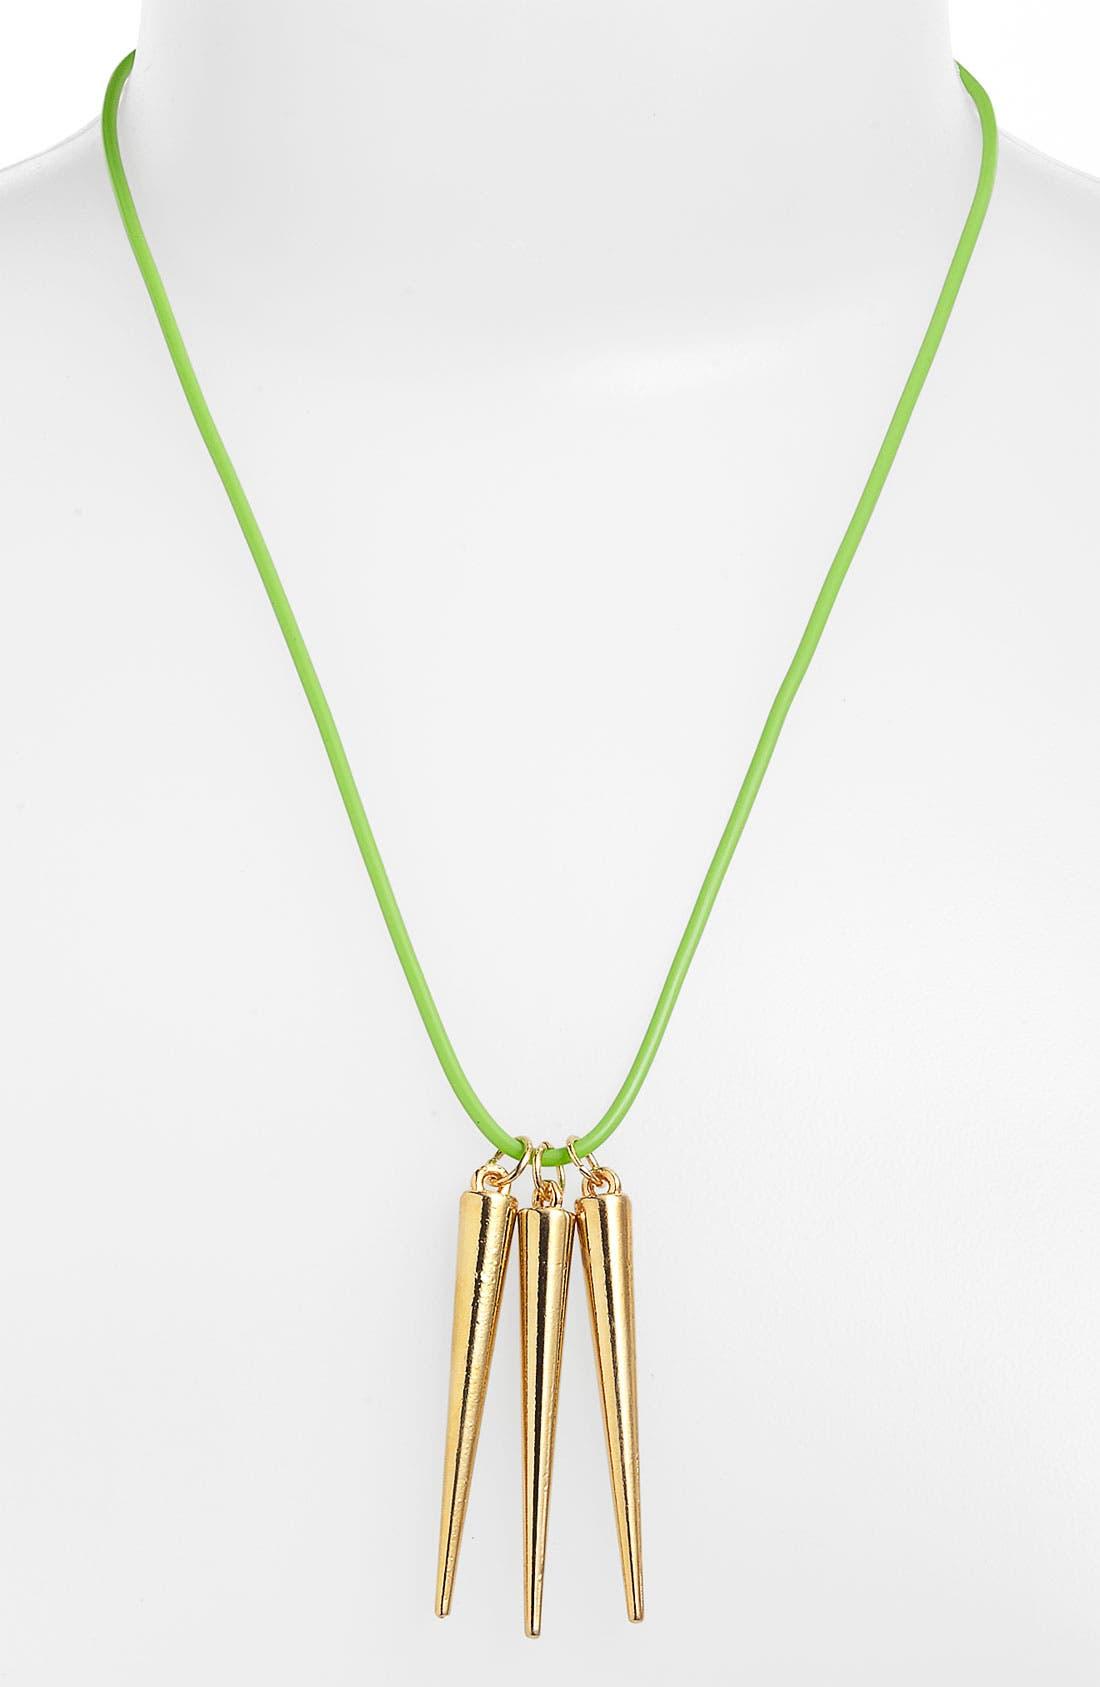 Alternate Image 1 Selected - Gelley Spike Necklace